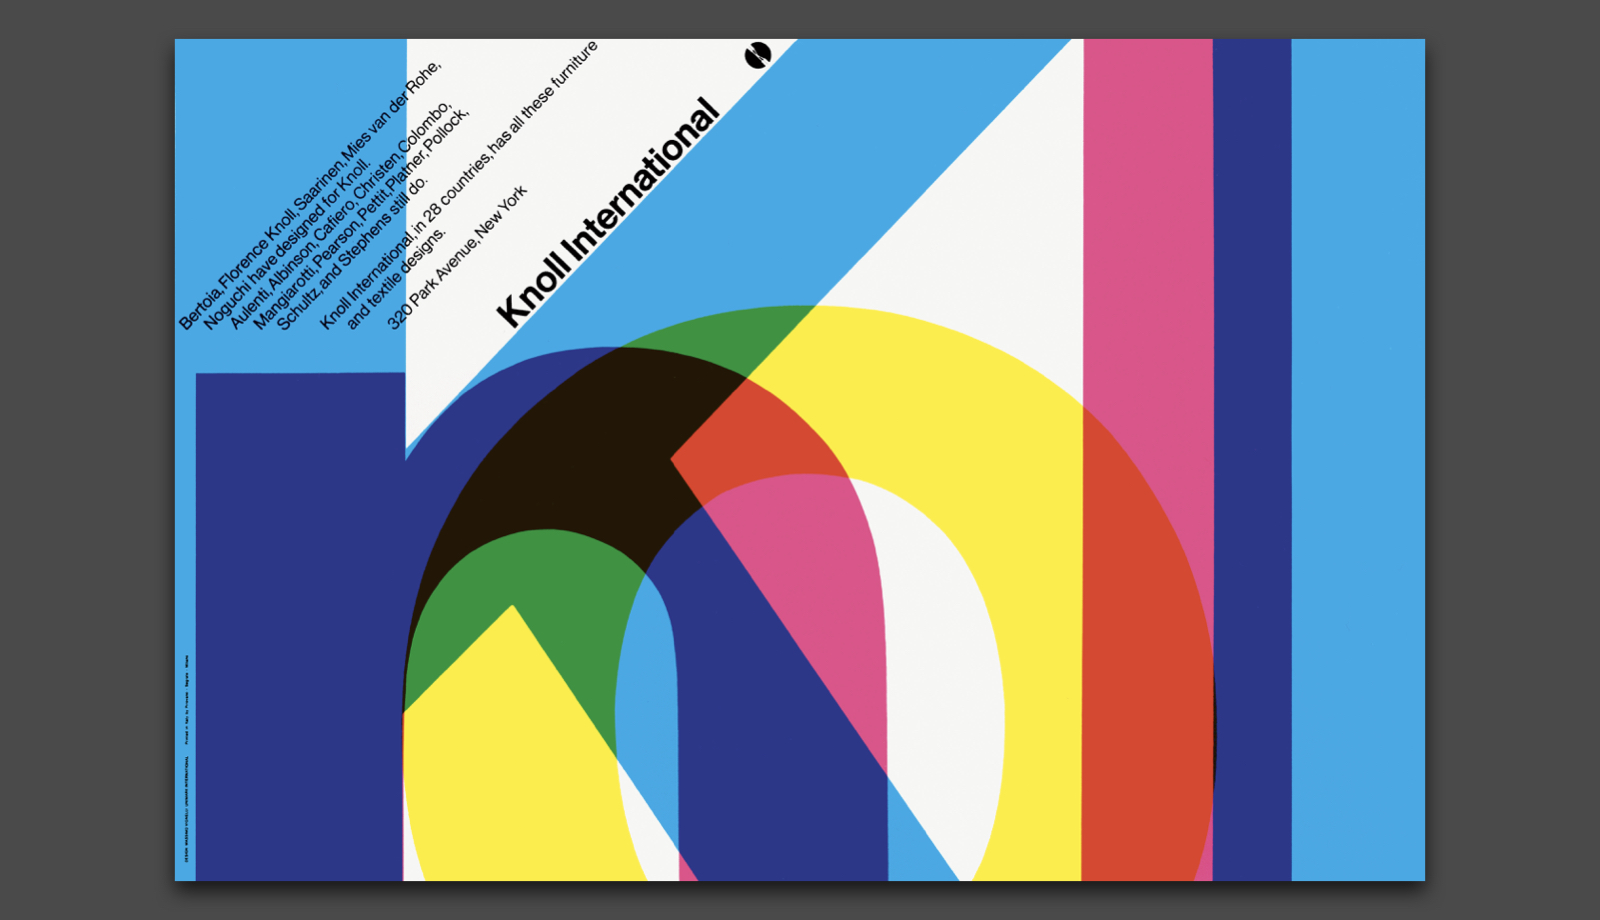 171213_Designkritik_ReneSpitz_JensMueller_Grafikdesign1960-heute